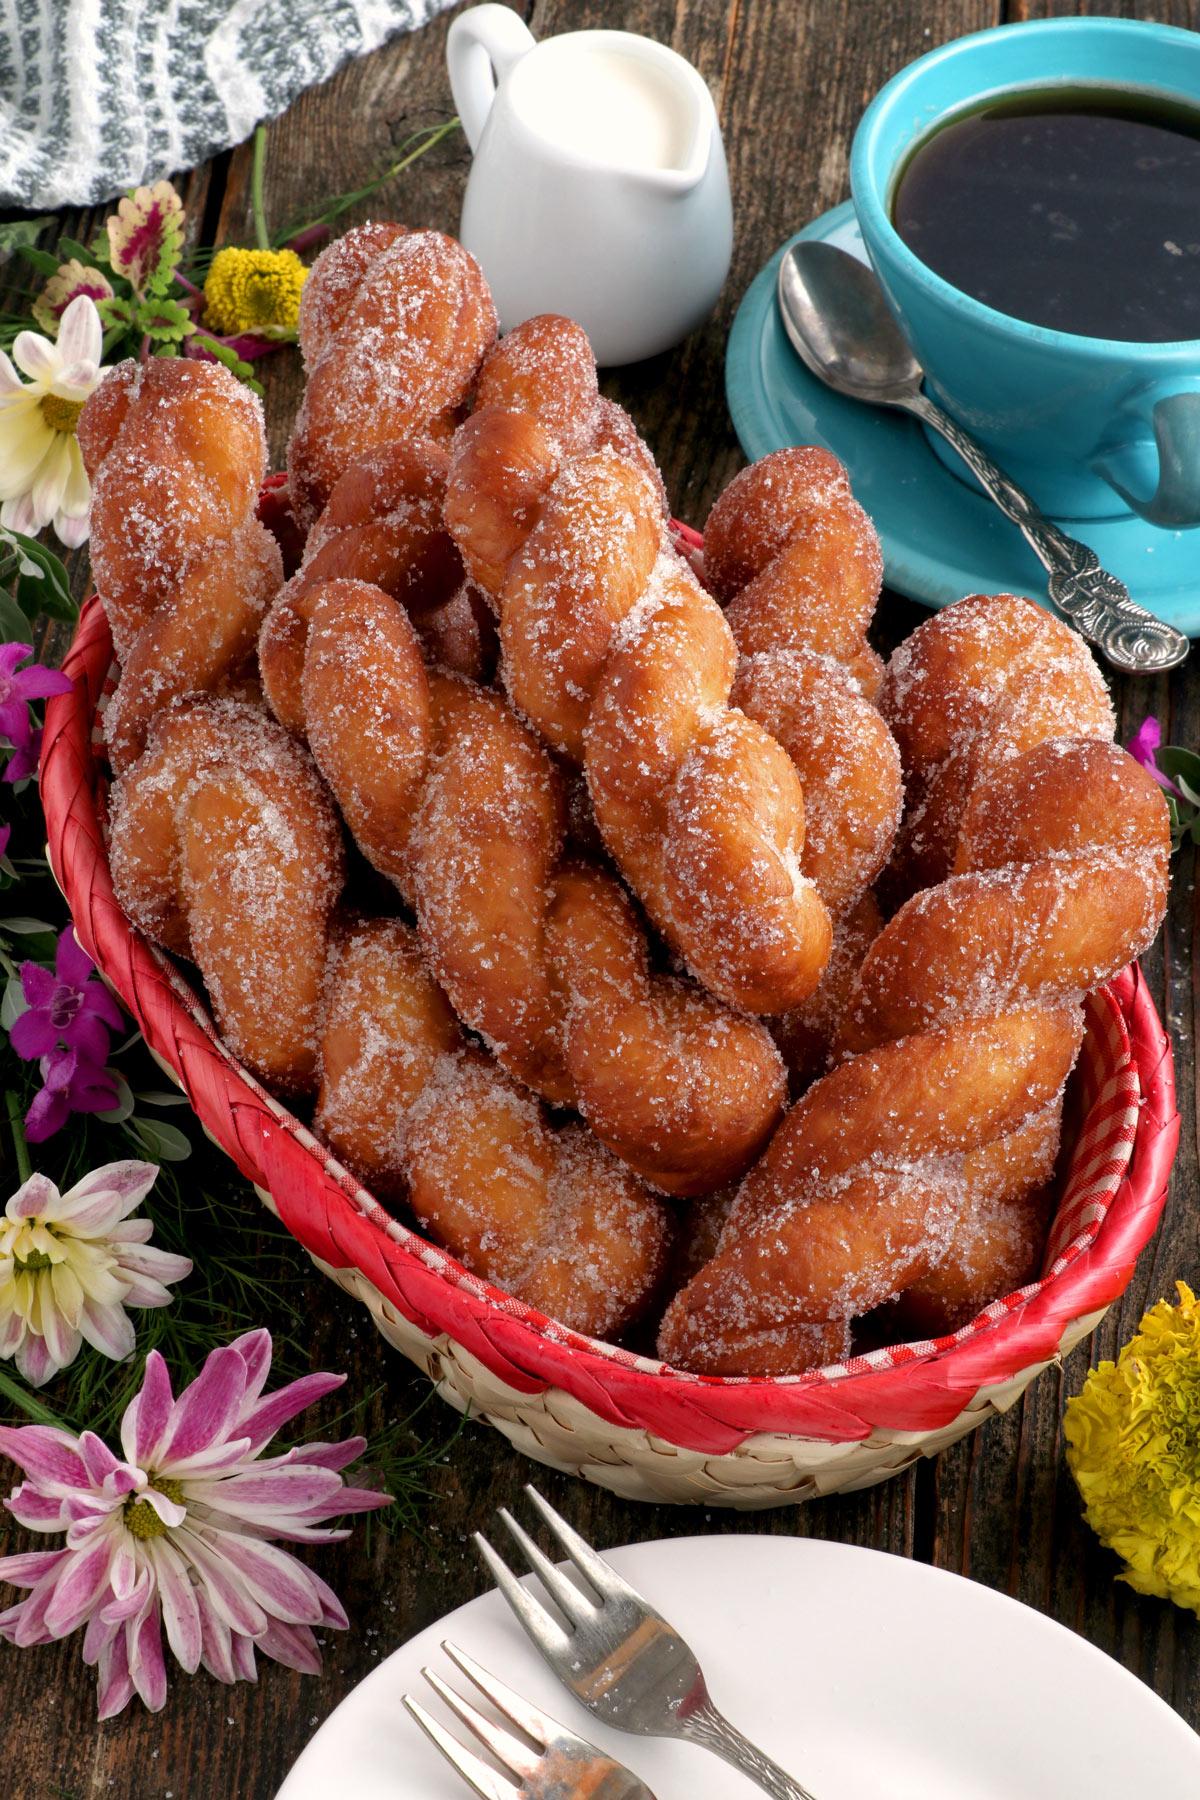 Bicho-bicho or Filipino twisted donuts served on a basket